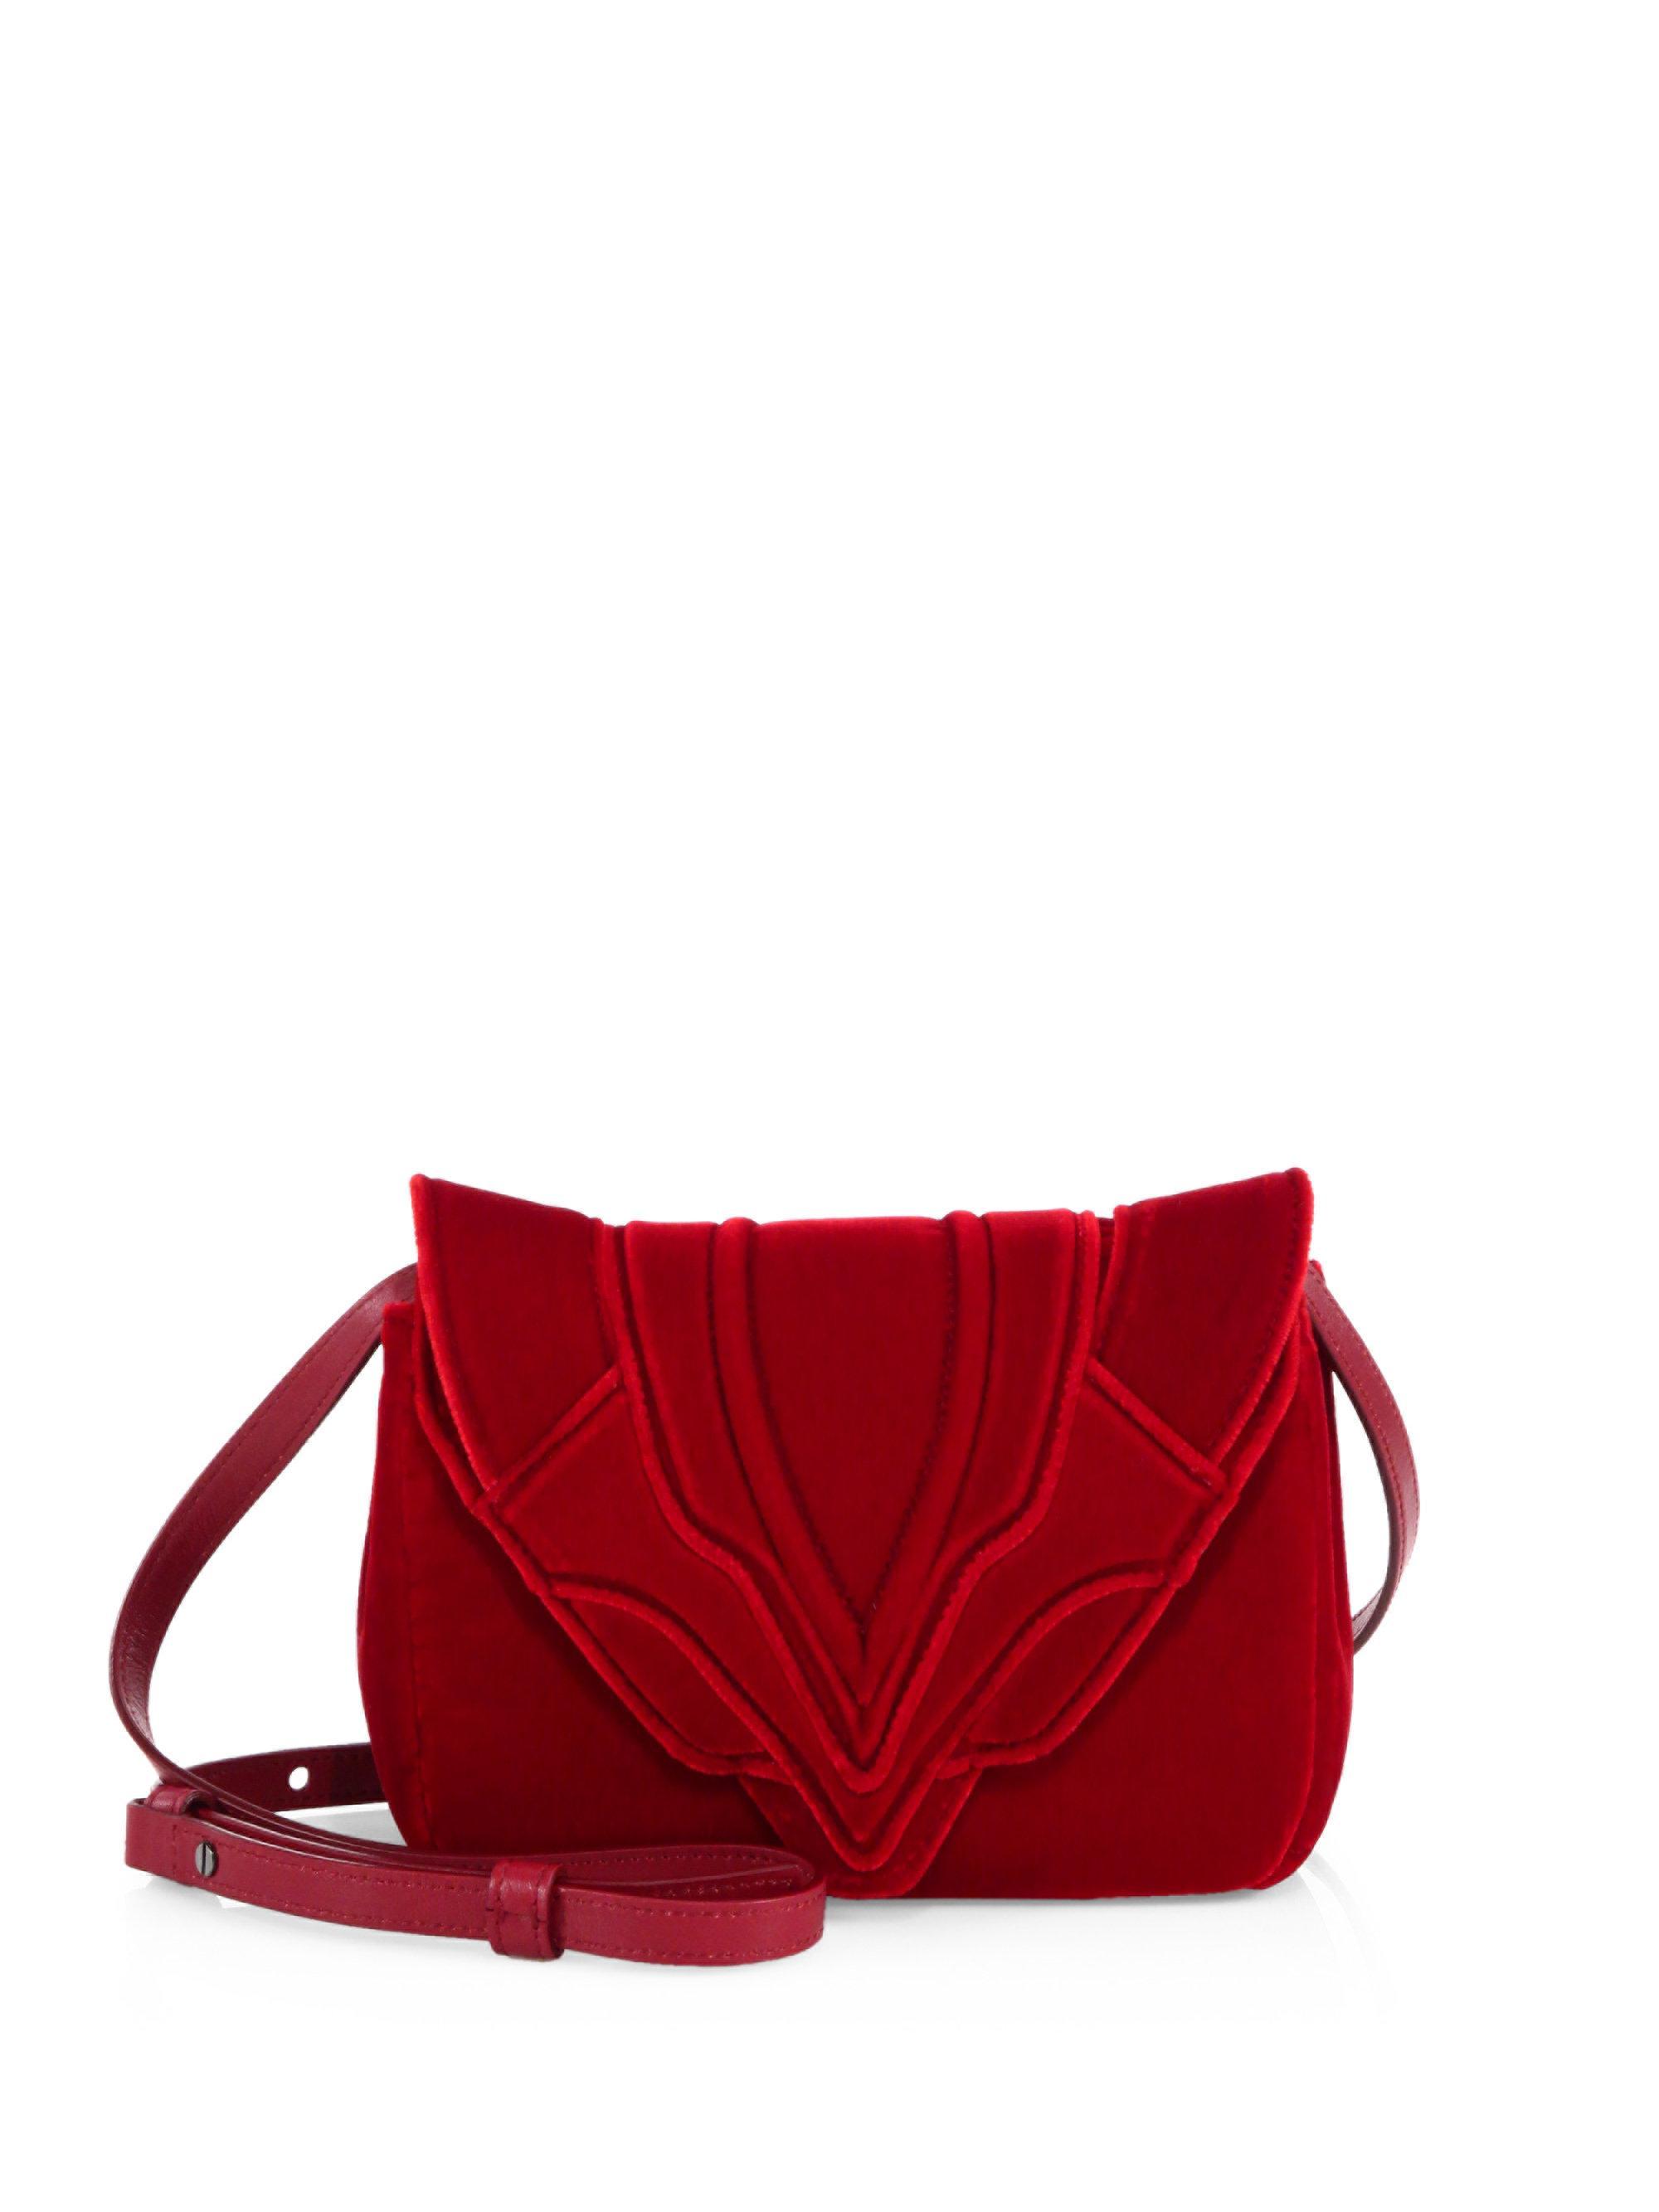 HANDBAGS - Cross-body bags Elena Ghisellini Sale How Much Clearance Websites MTgf9TCcC7